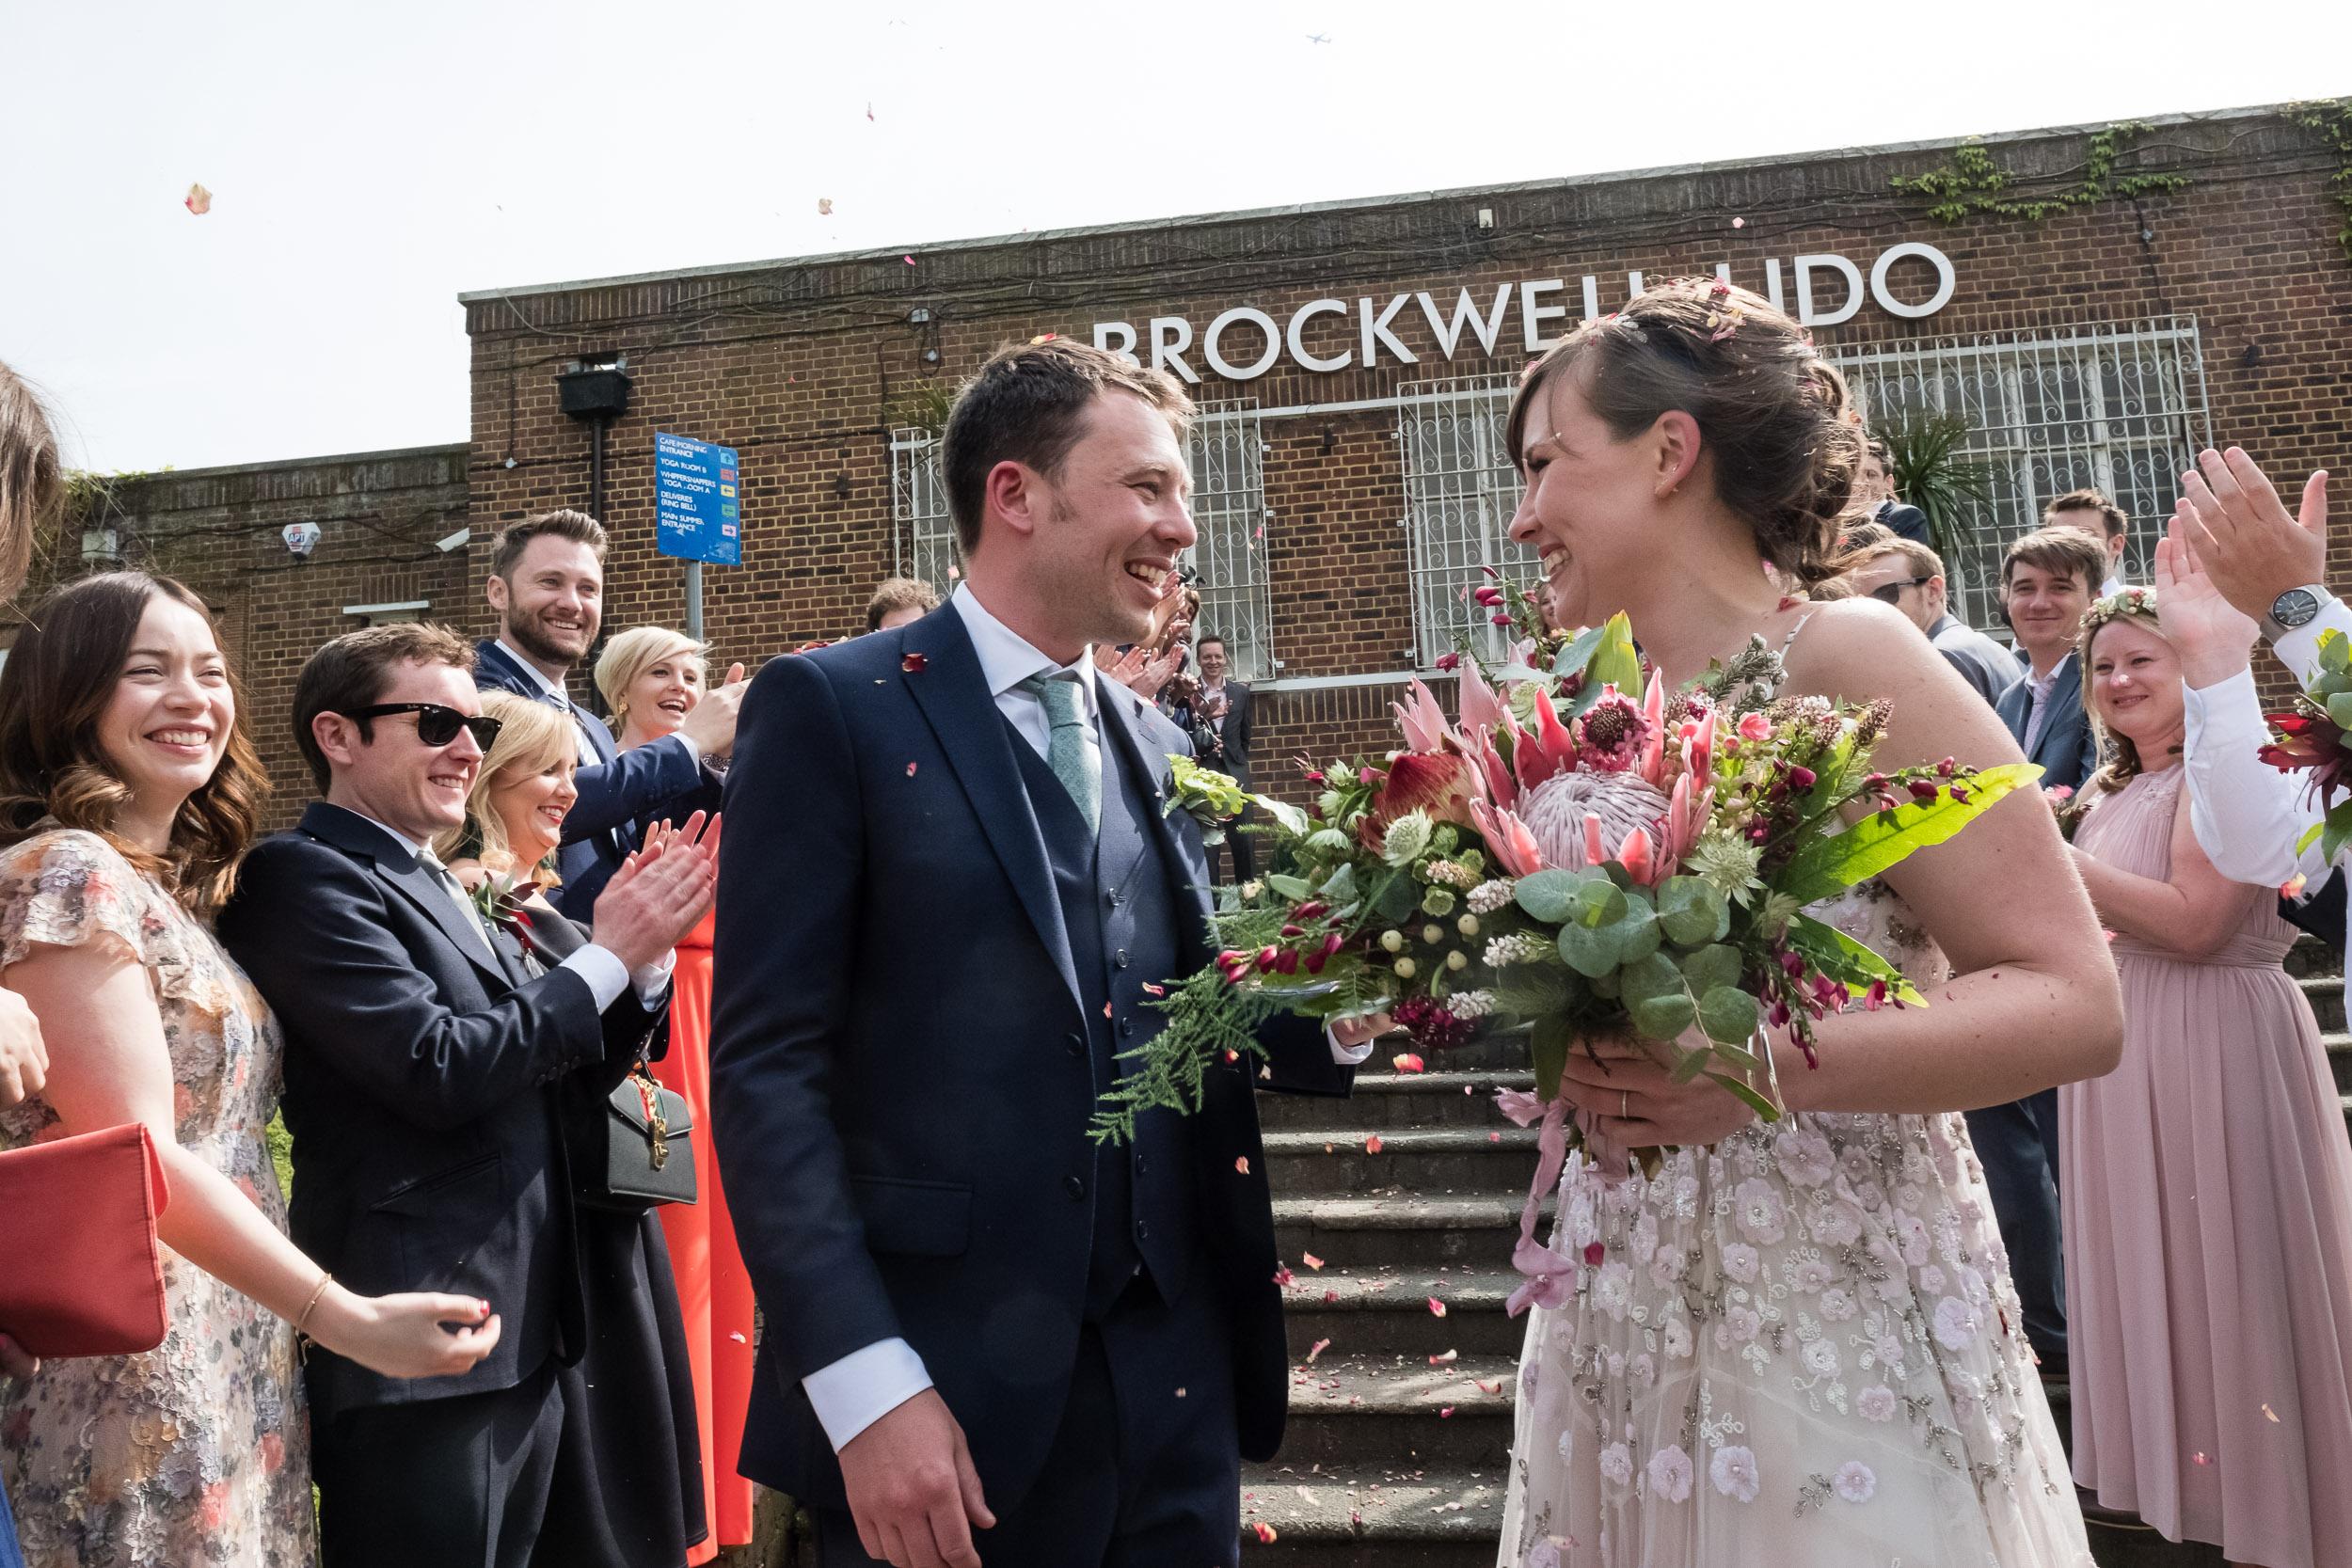 brockwell-lido-brixton-herne-hill-wedding-218.jpg